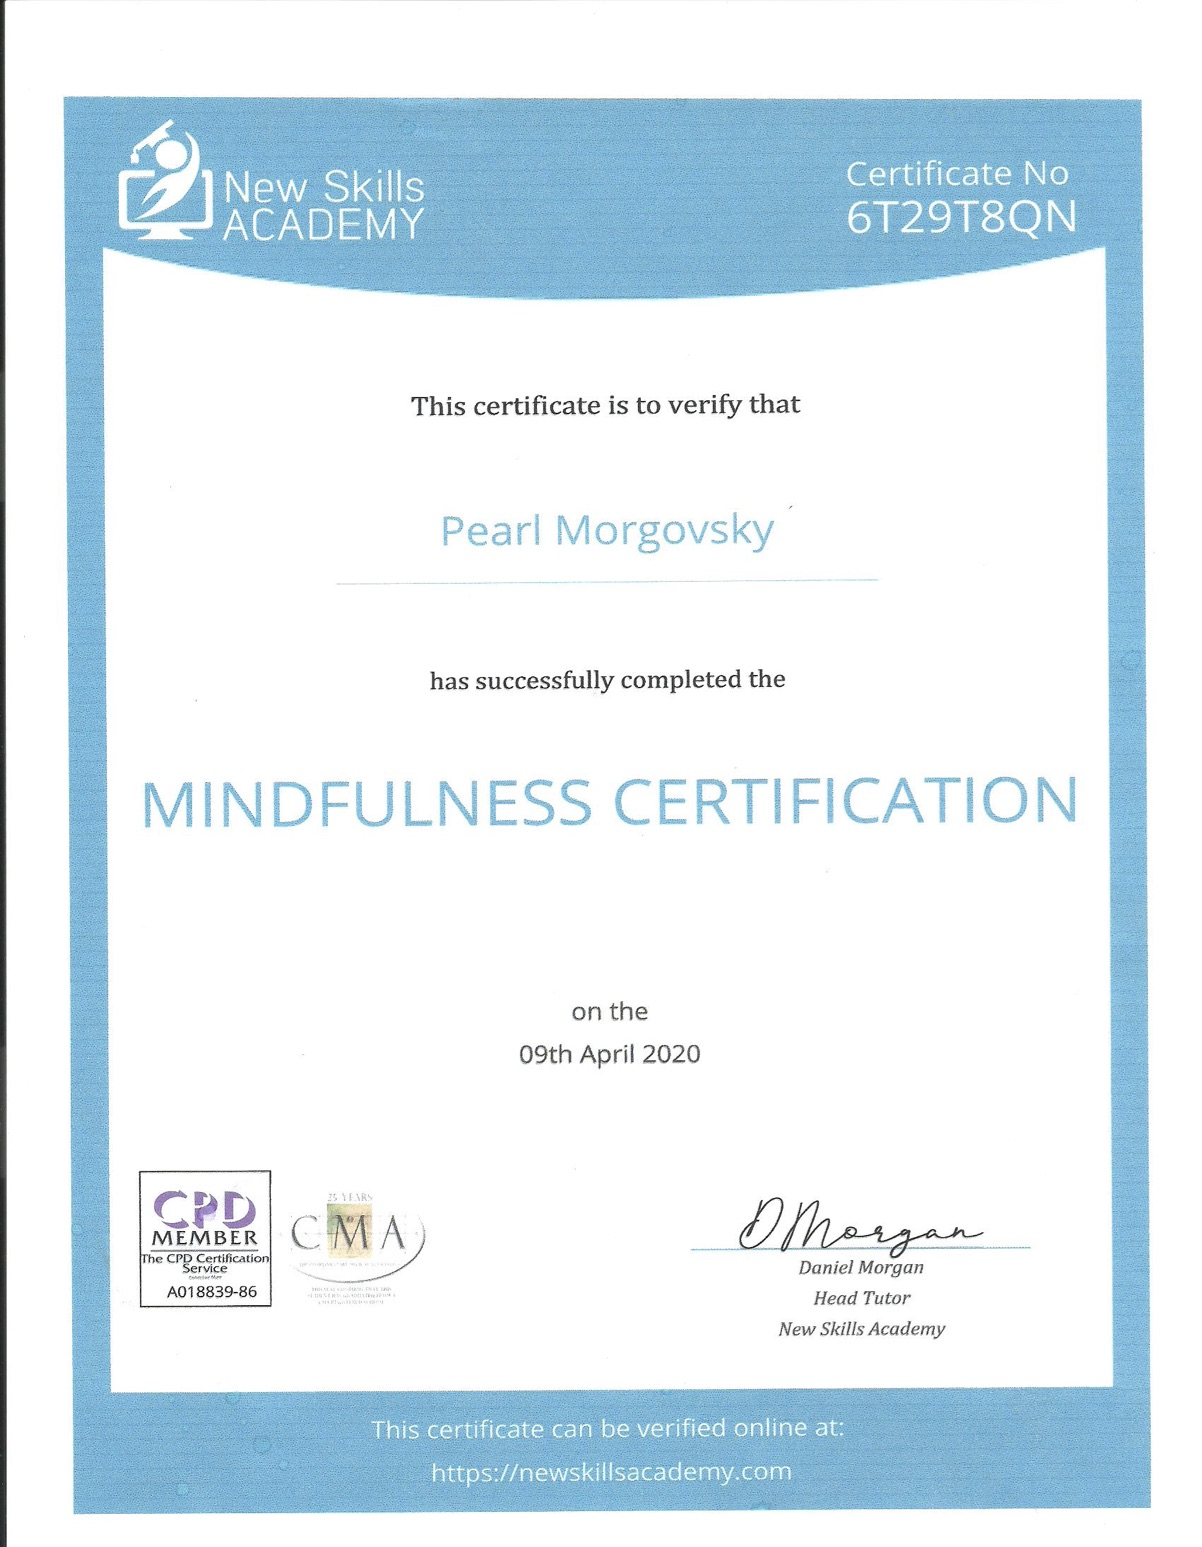 CoC New Skills Academy : Mindfulness Certifcation